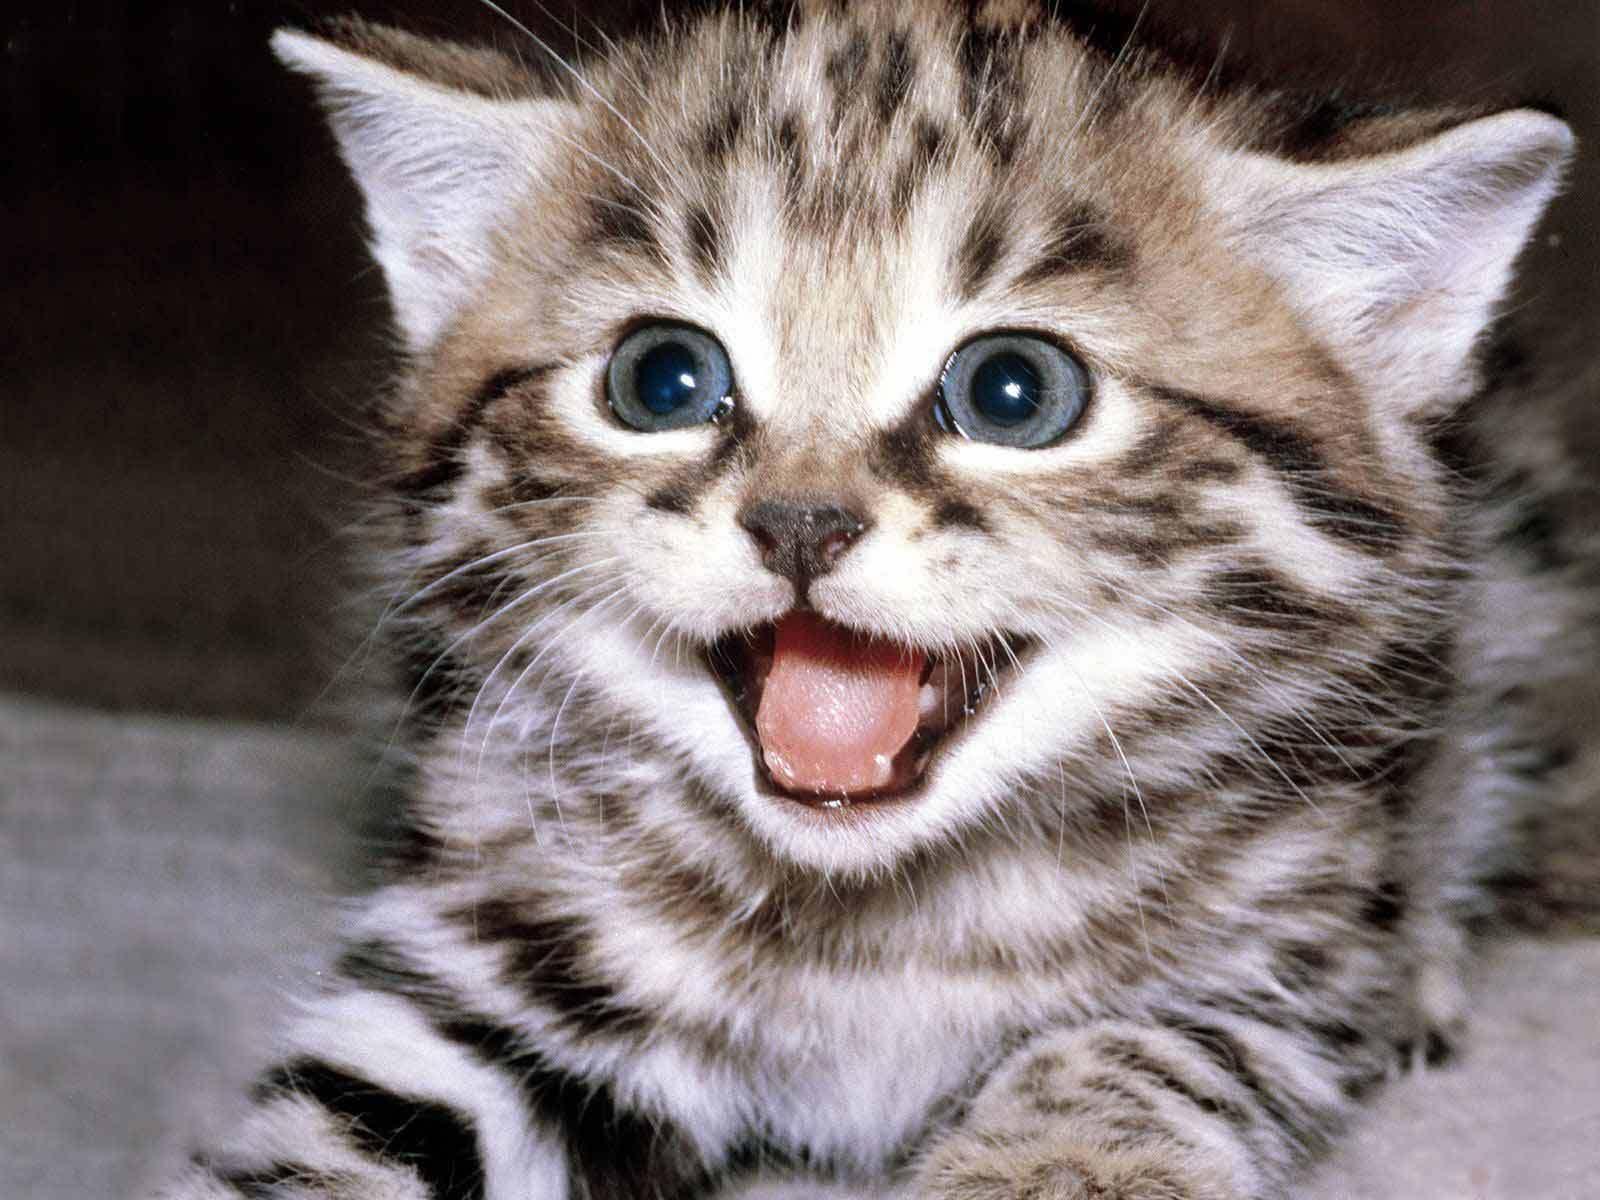 cute-kittens-12929201-1600-1200.jpg